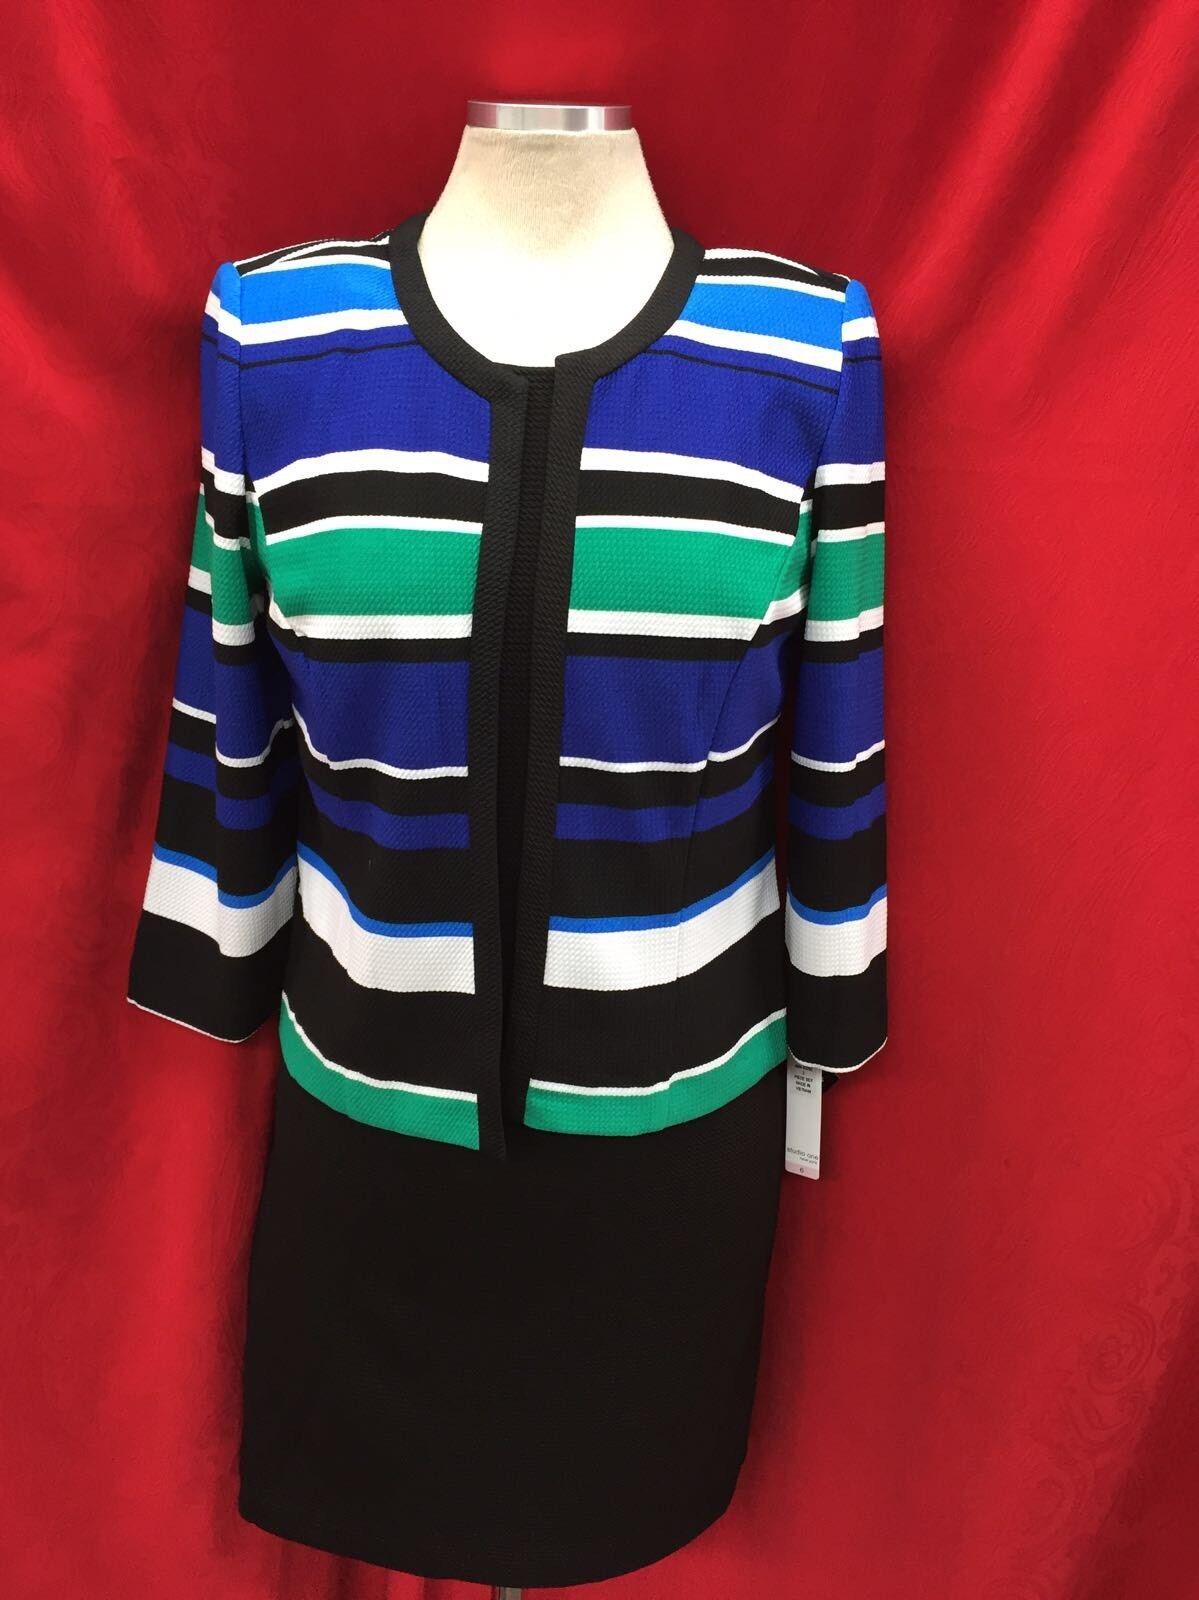 SANDRA DARREN DRESS SUIT SIZE 24W NEW WITH TAG DRESS LENGTH 42